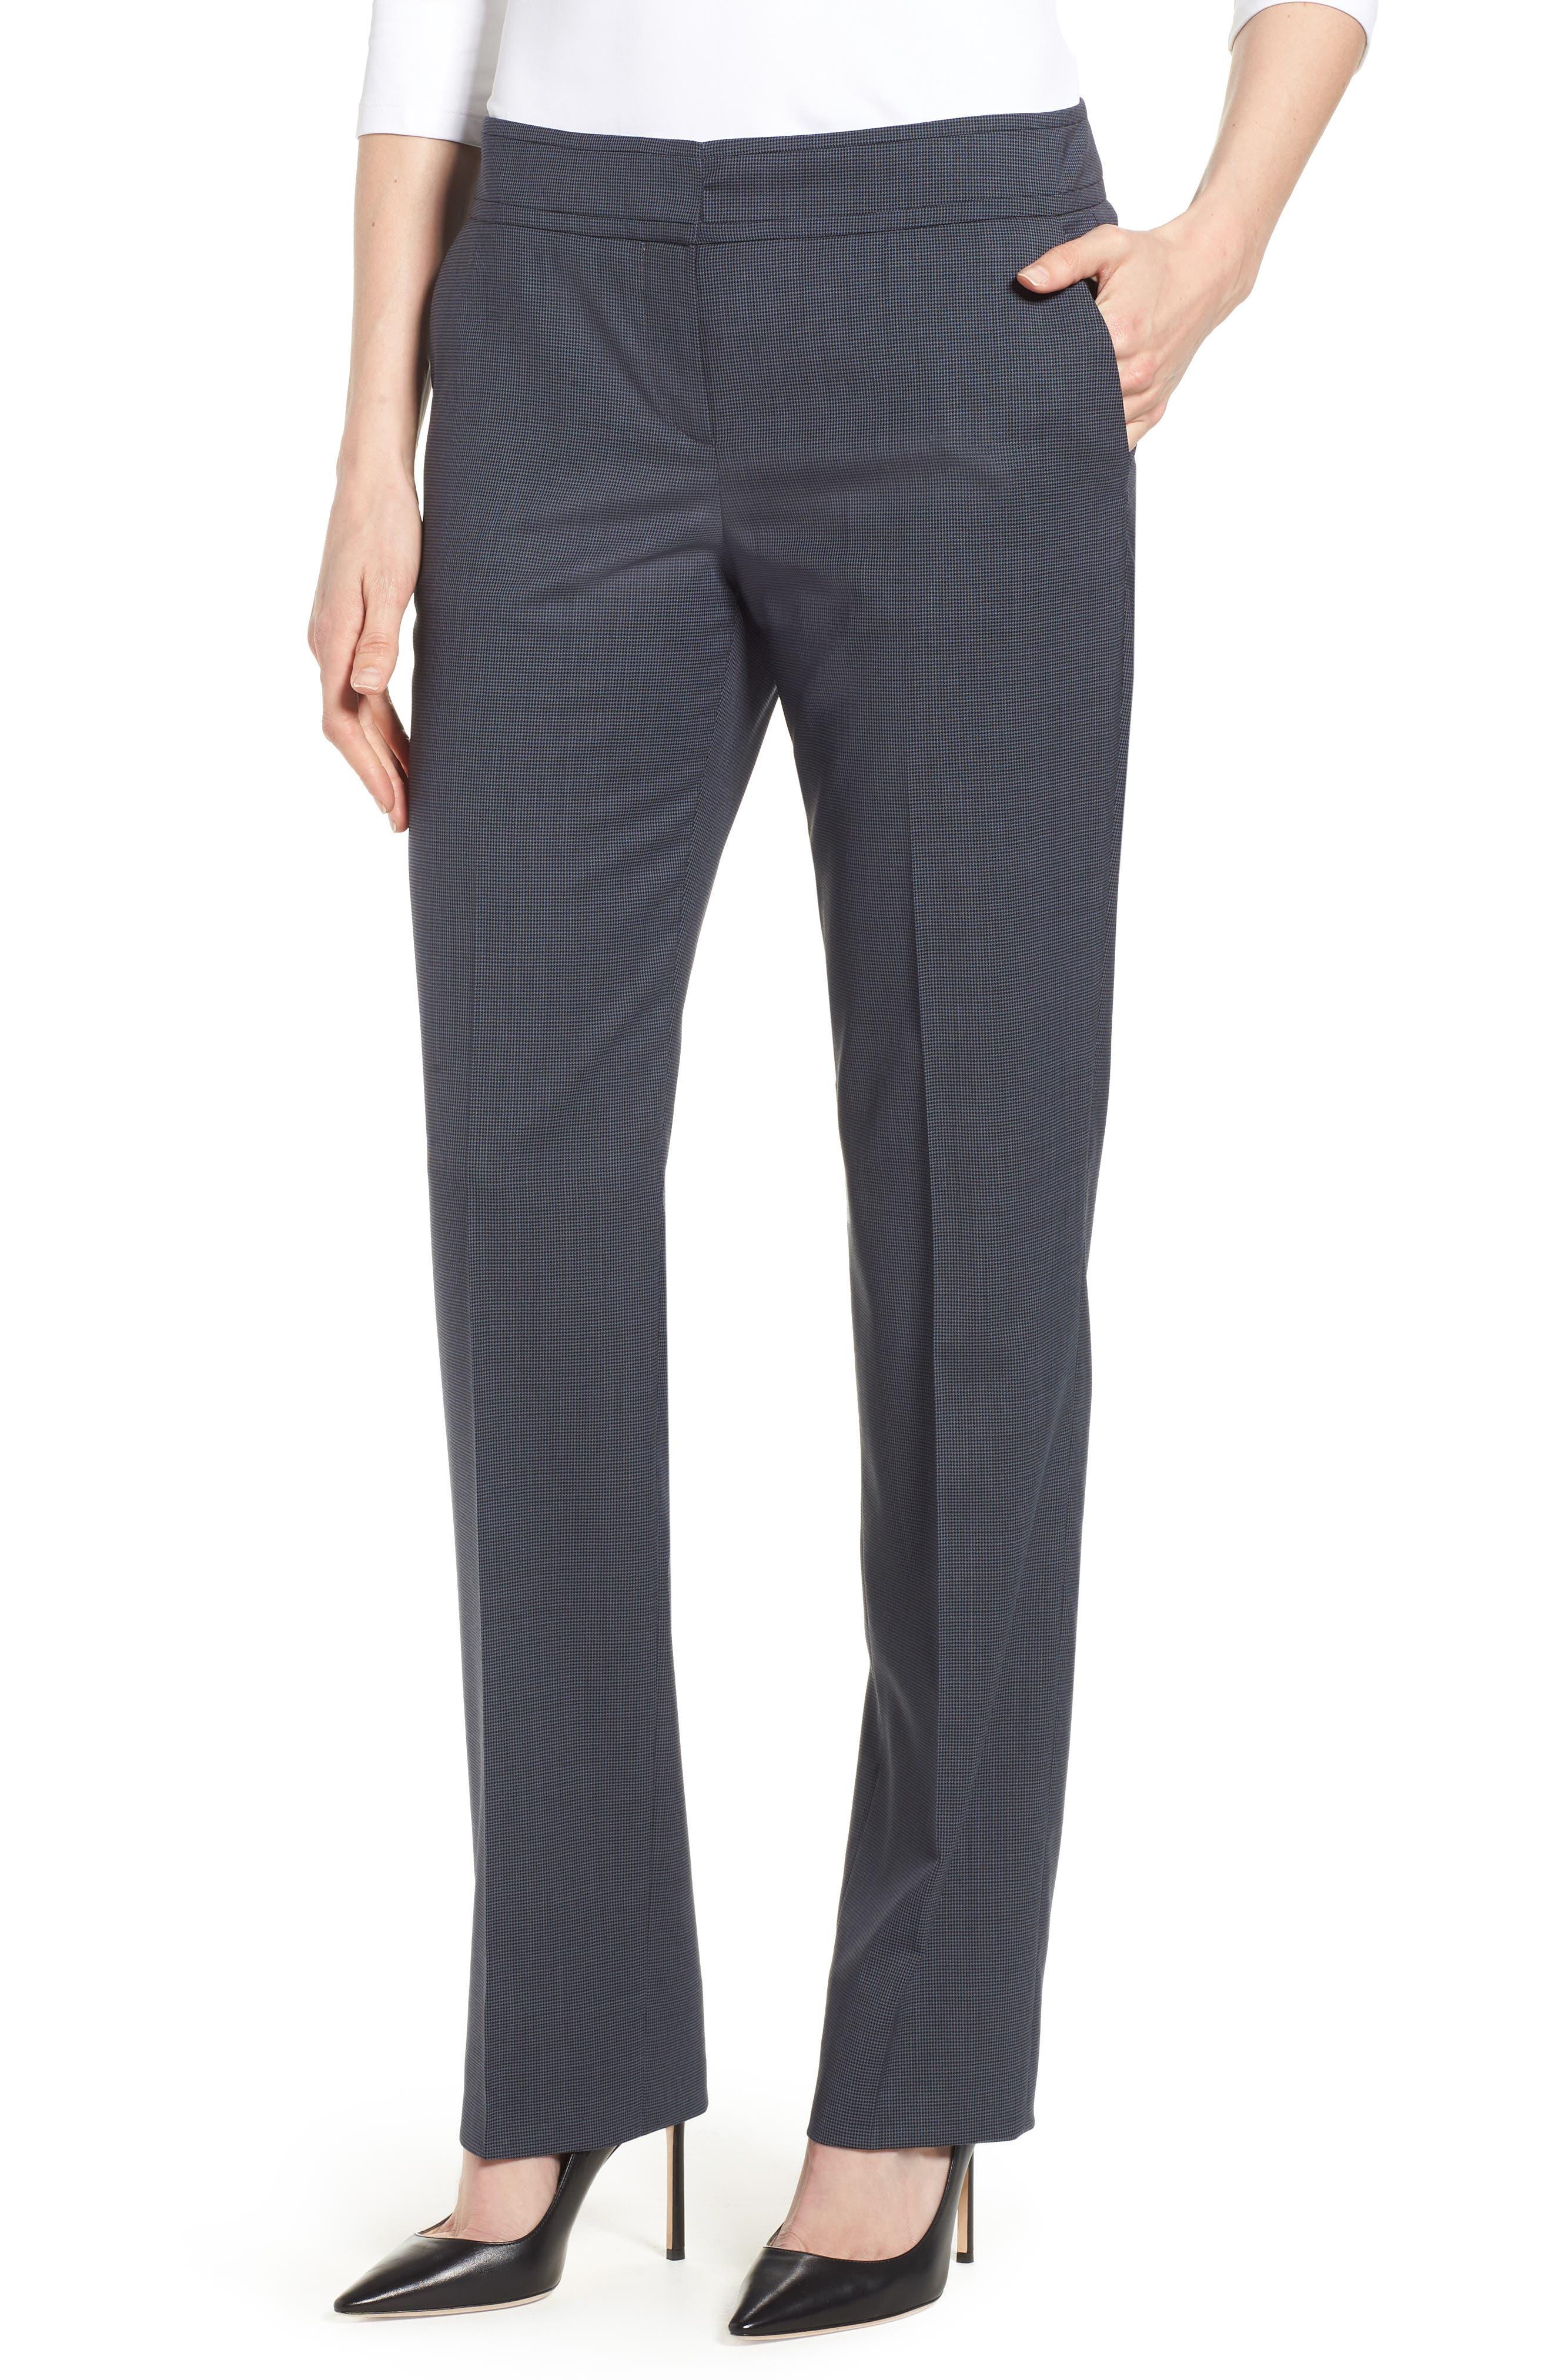 Talouise Pepita Stretch Wool Suit Pants,                         Main,                         color, 462